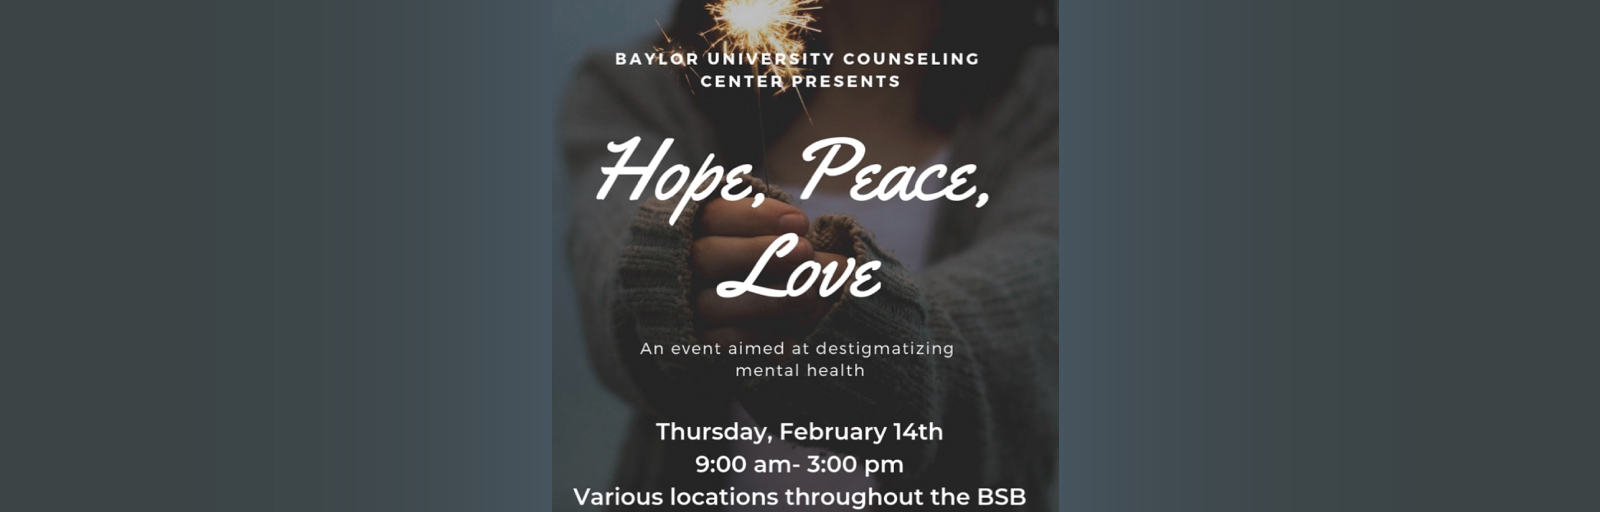 Hope_Peace_Love_2019